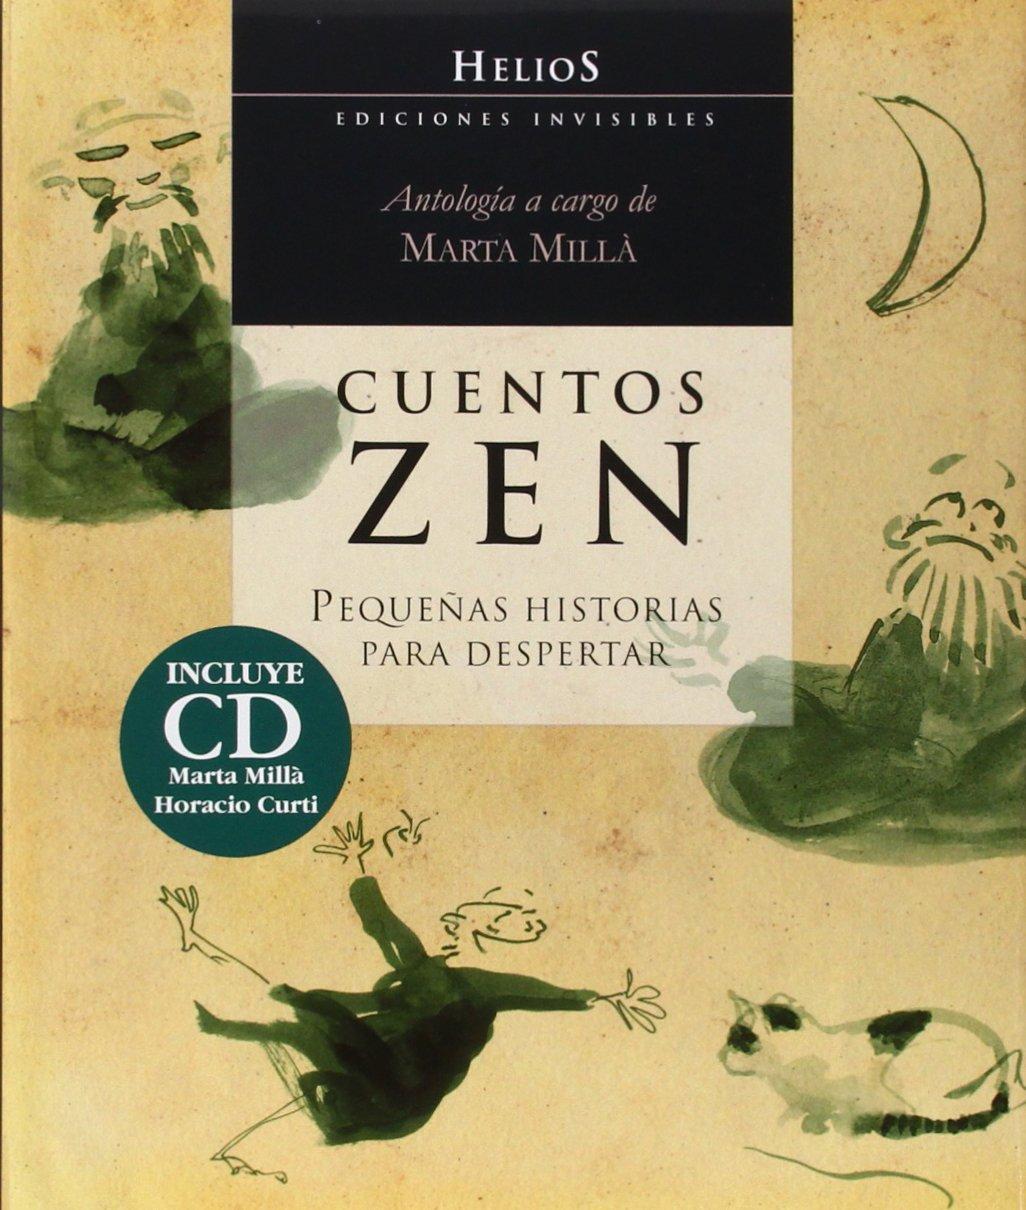 Cuentos zen : pequeñas historias para despertar: Marta Millà ...